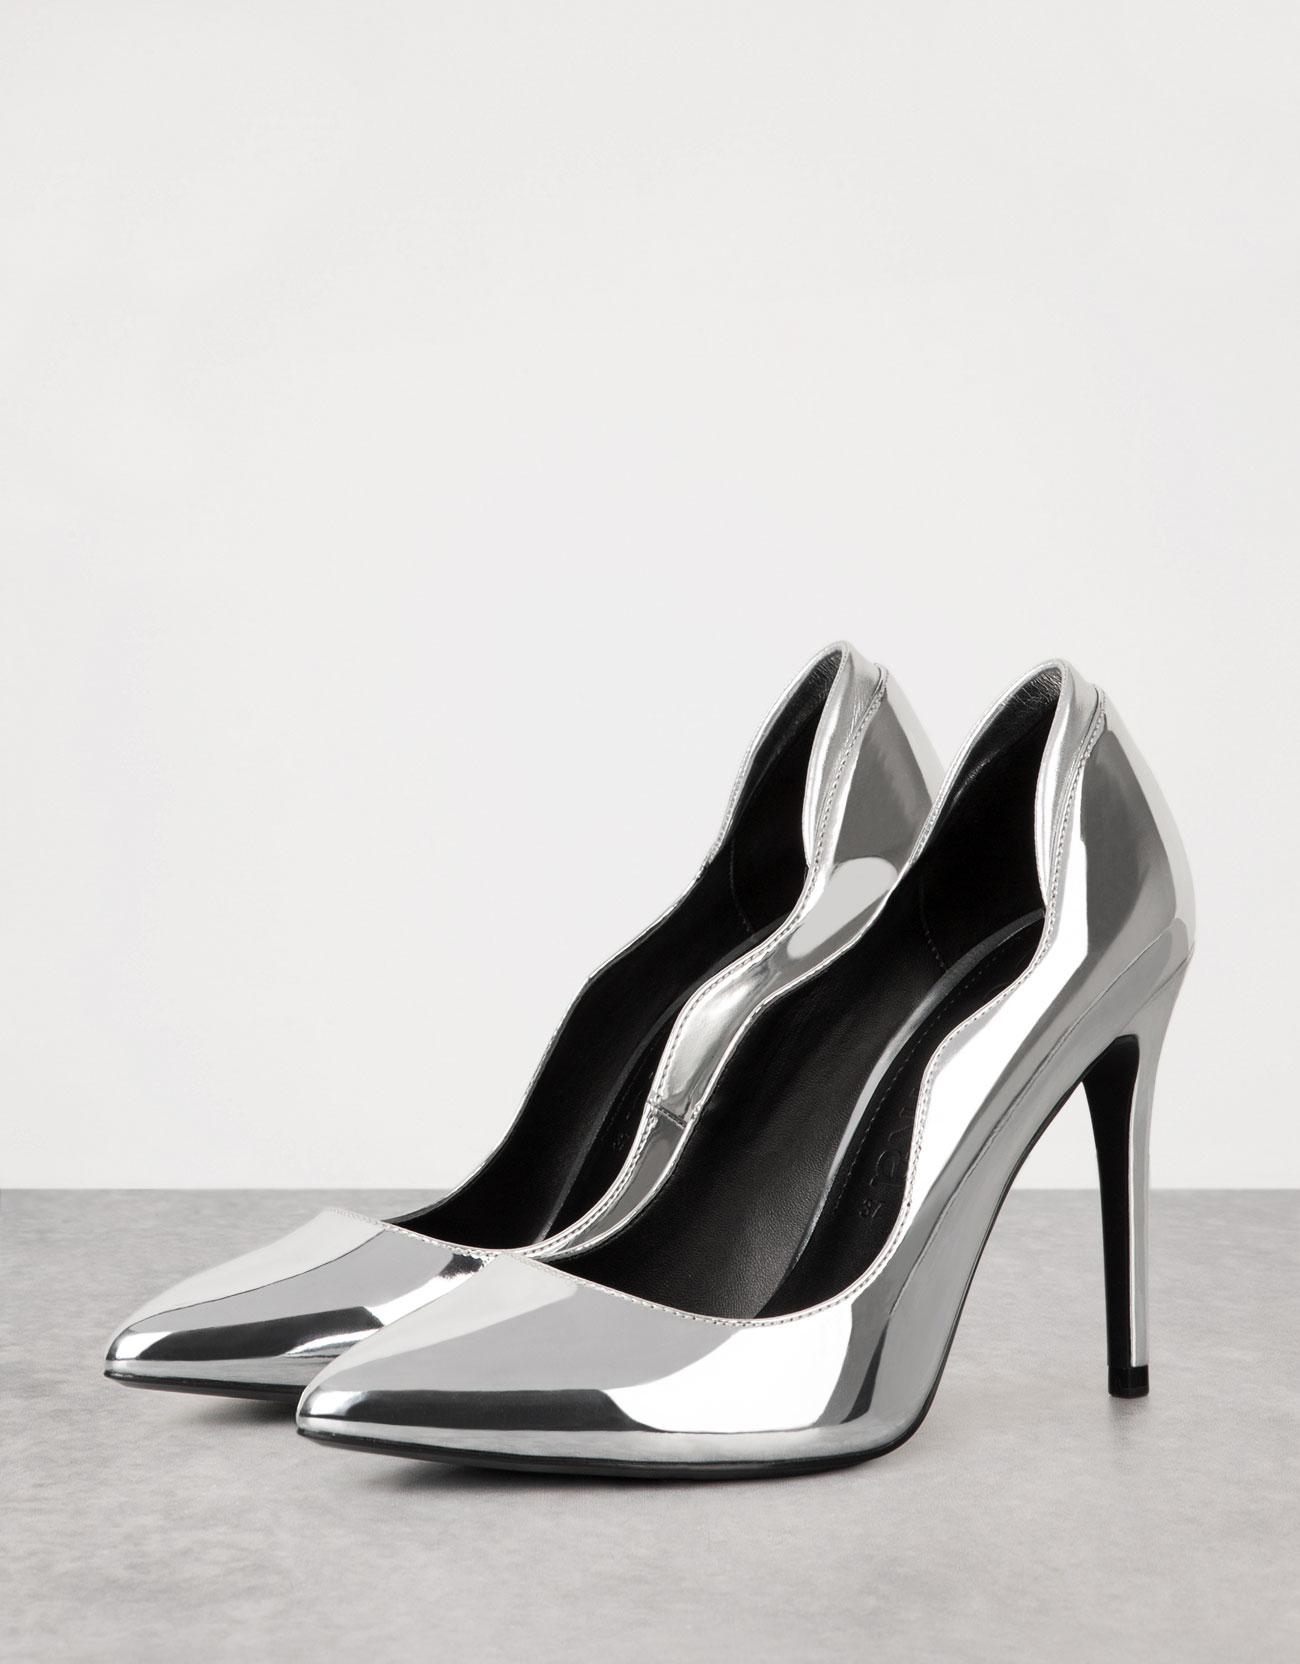 Metalik cipele Bershka, 229,90 kn